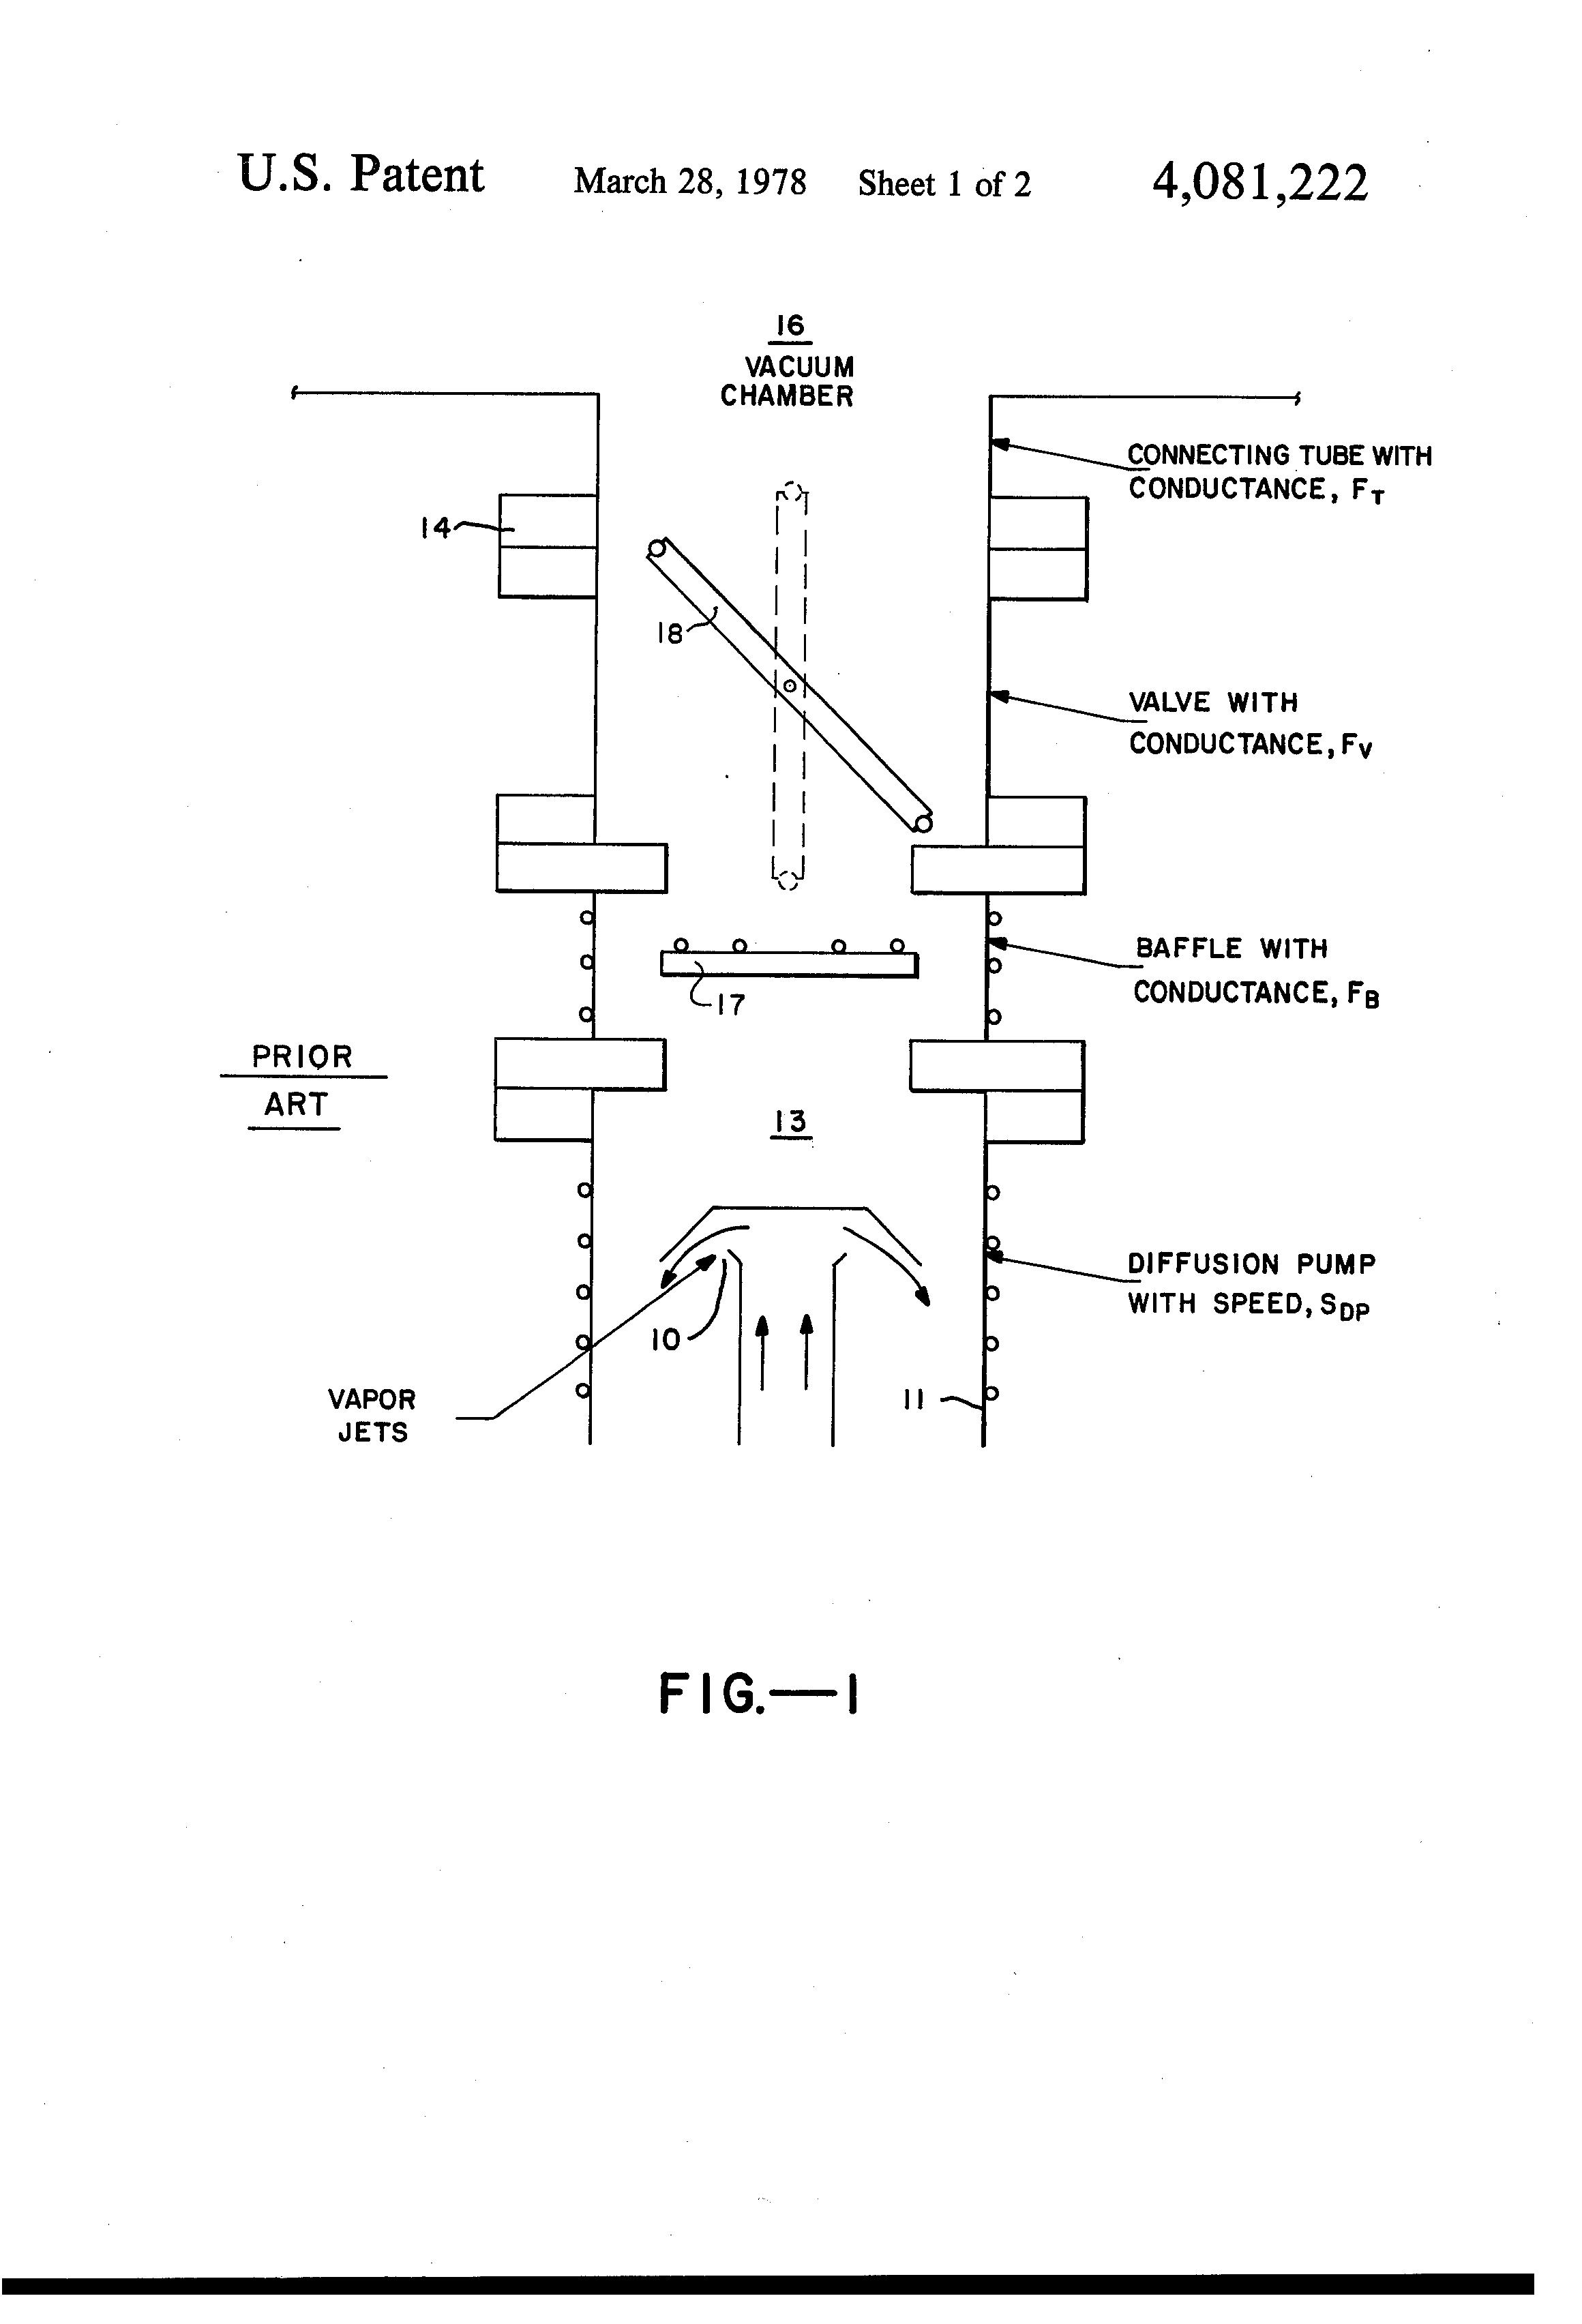 Tuff Pressure Washers Wiring Diagram - Wiring Diagram Work on